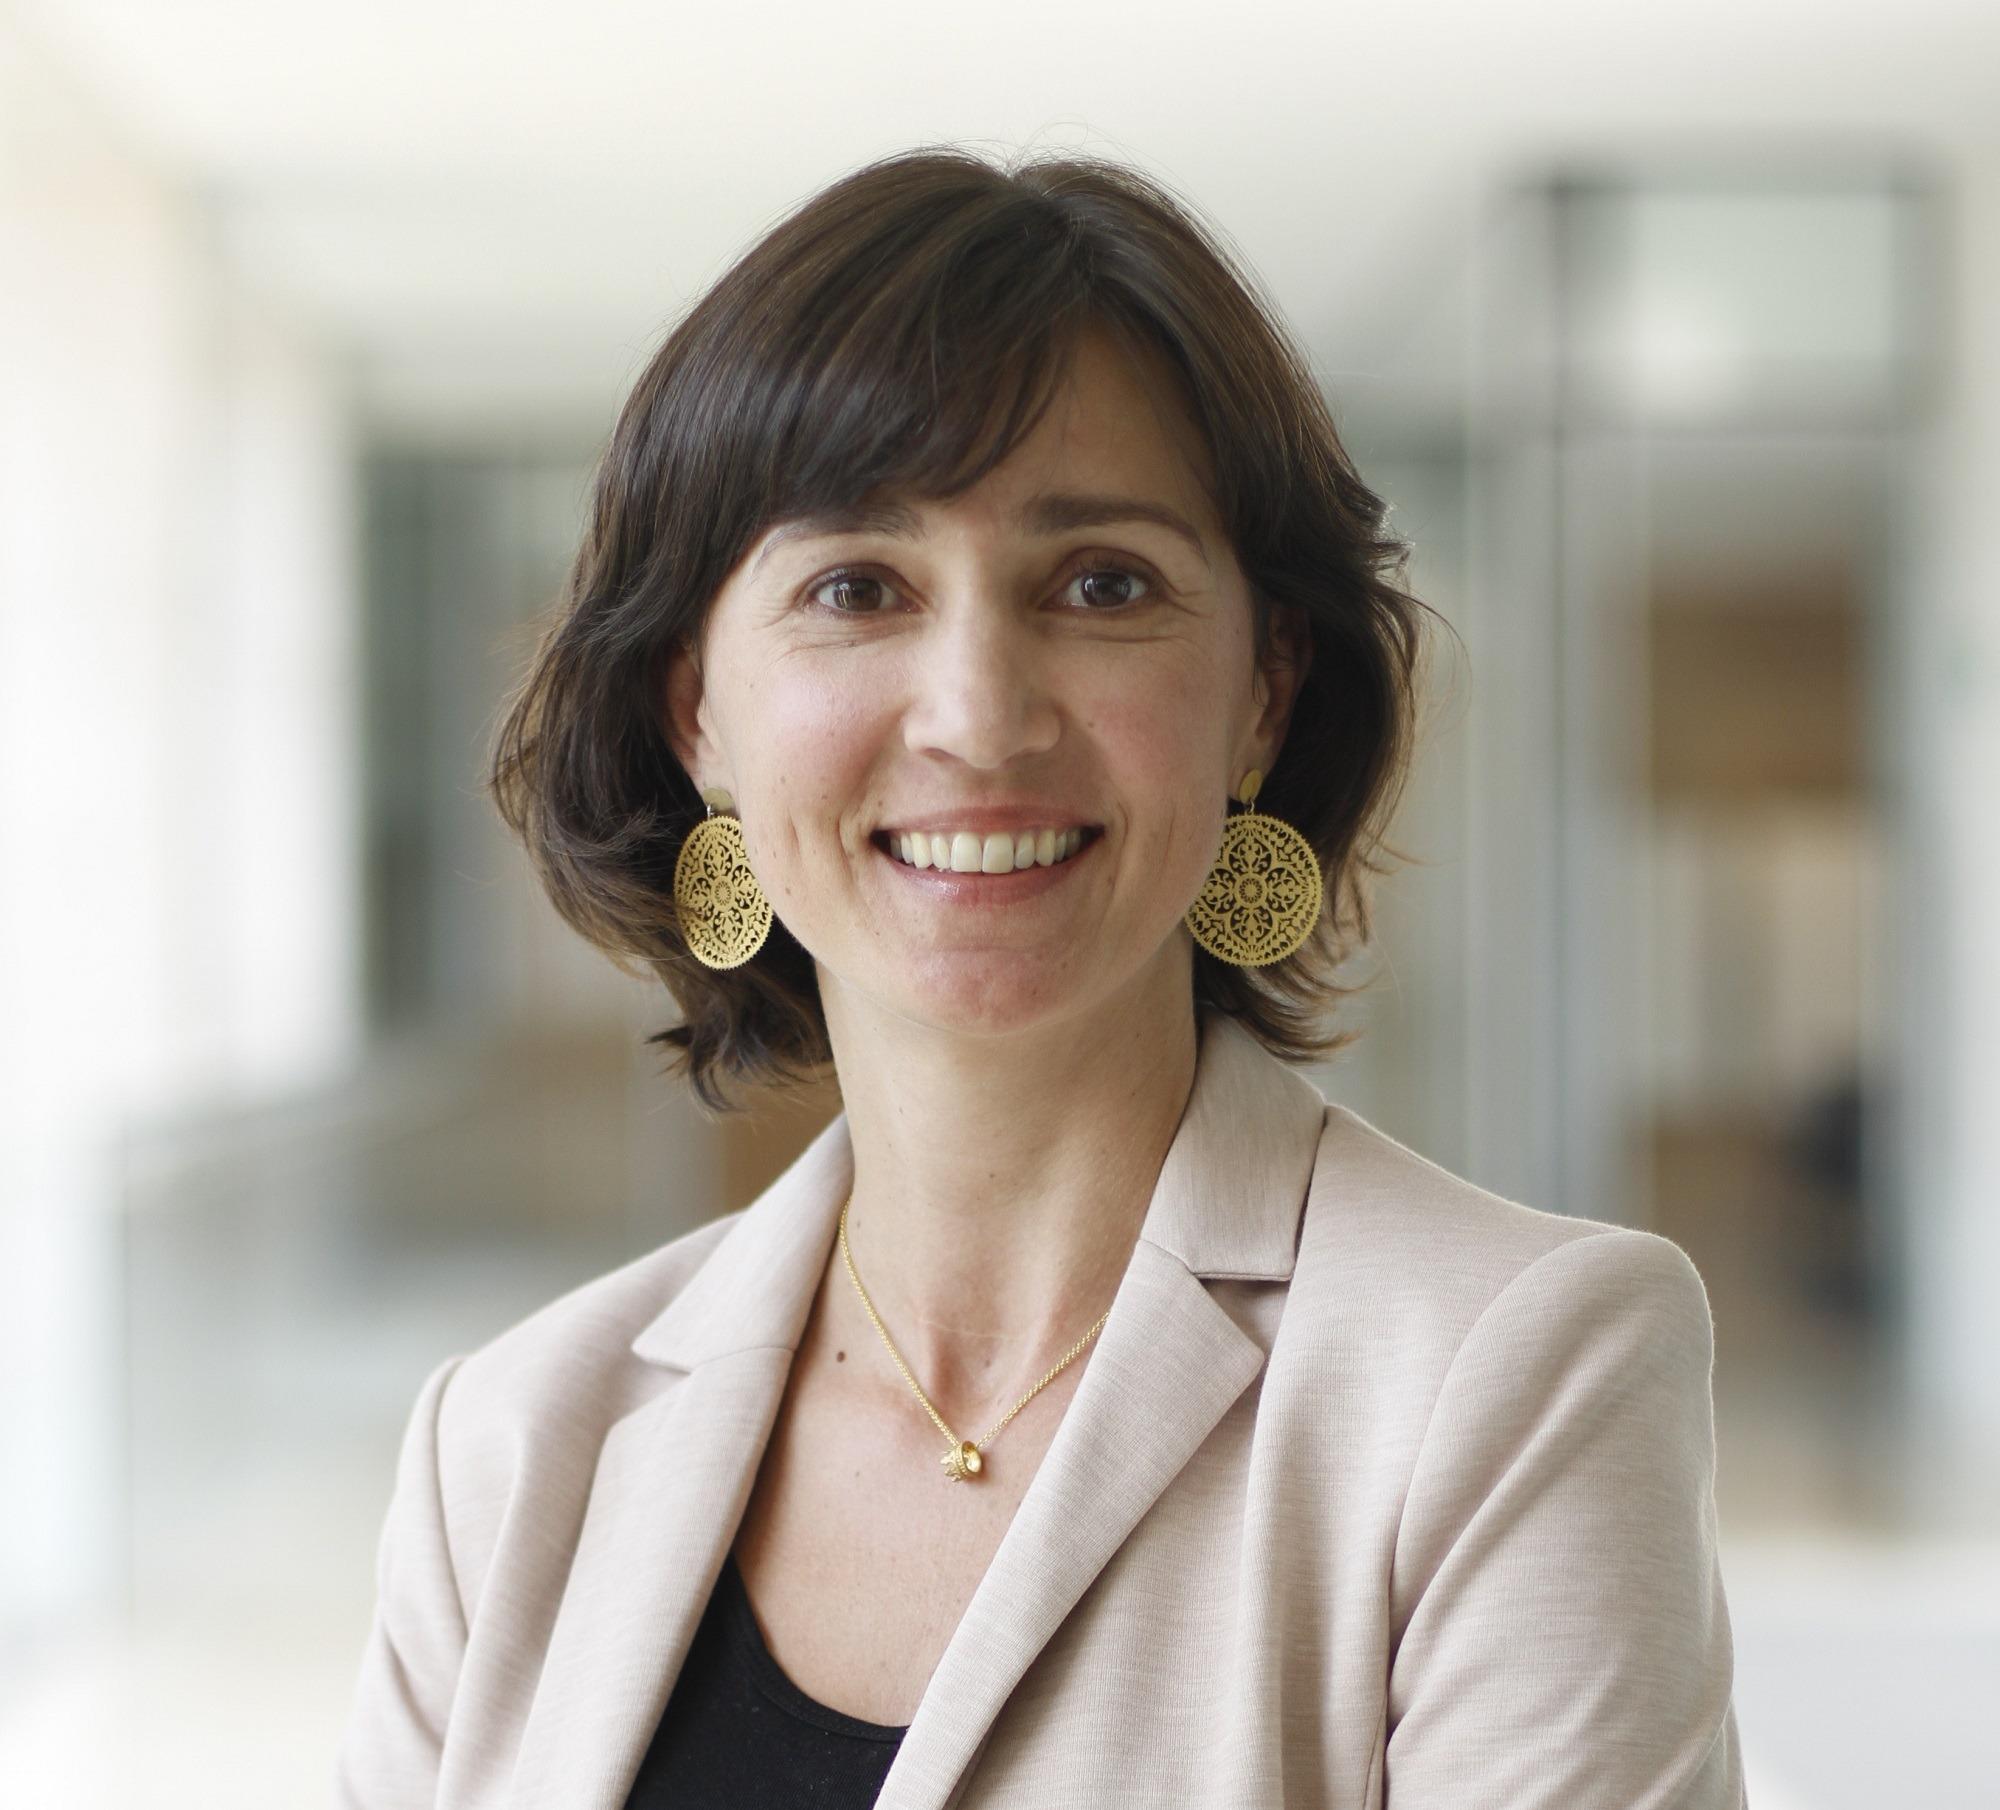 Ana María Troncoso Cruz